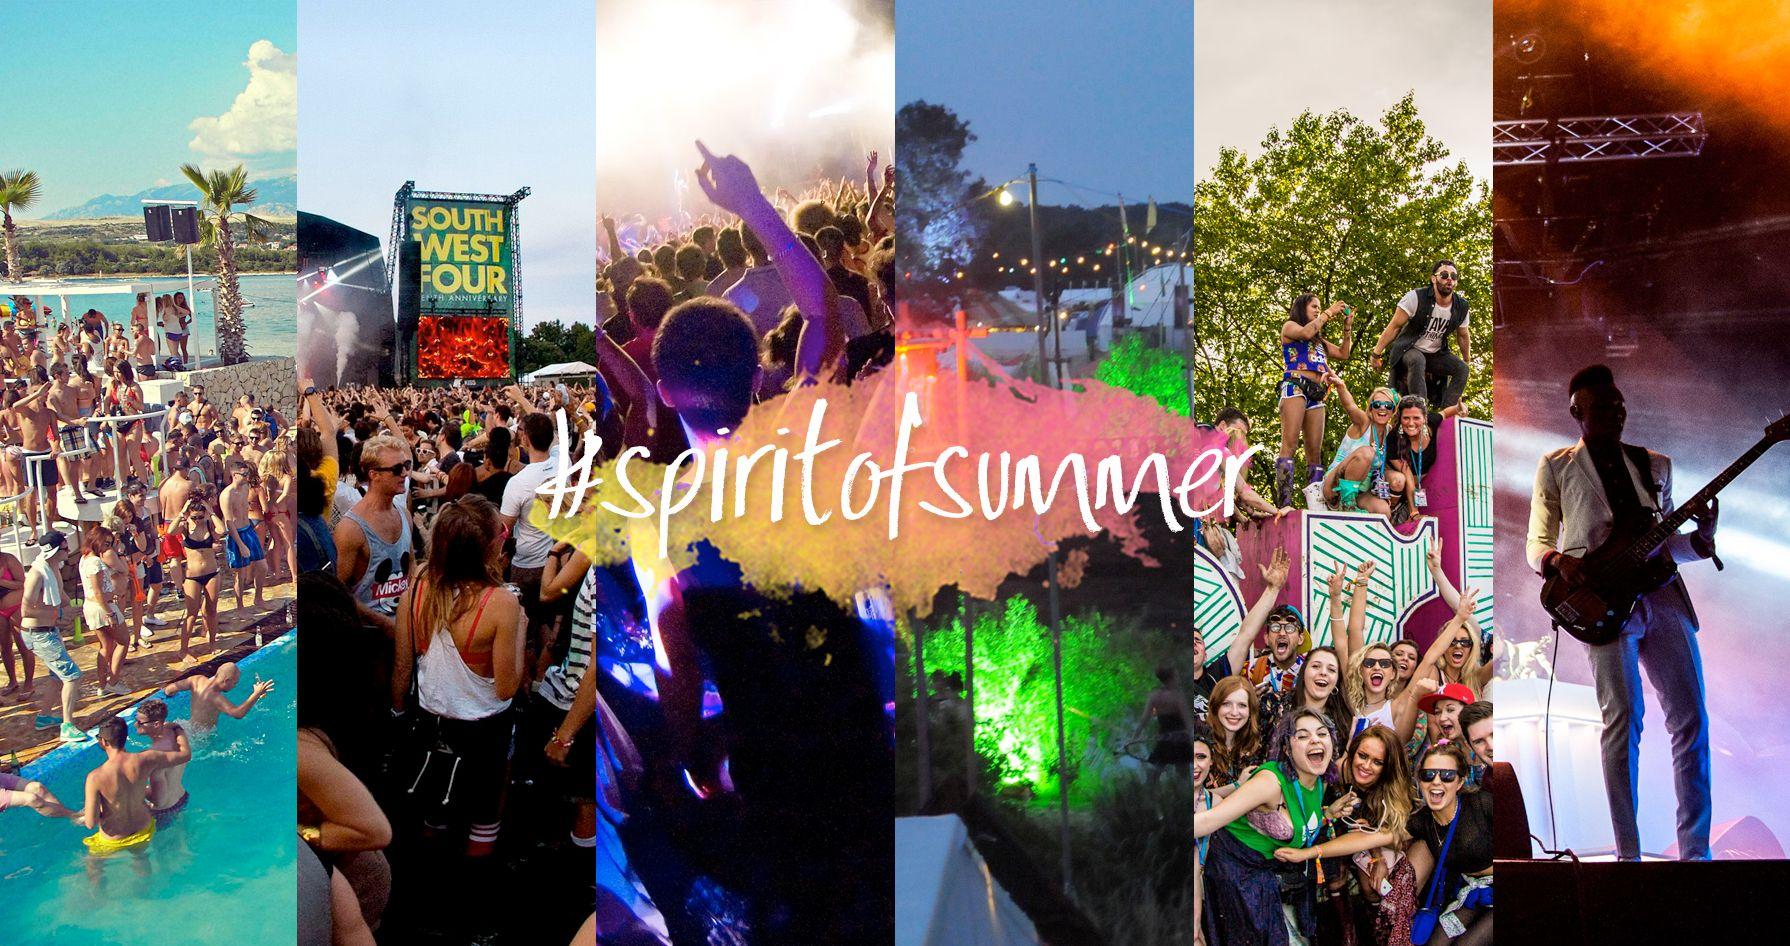 TOP SUMMER FESTIVALS OF 2015